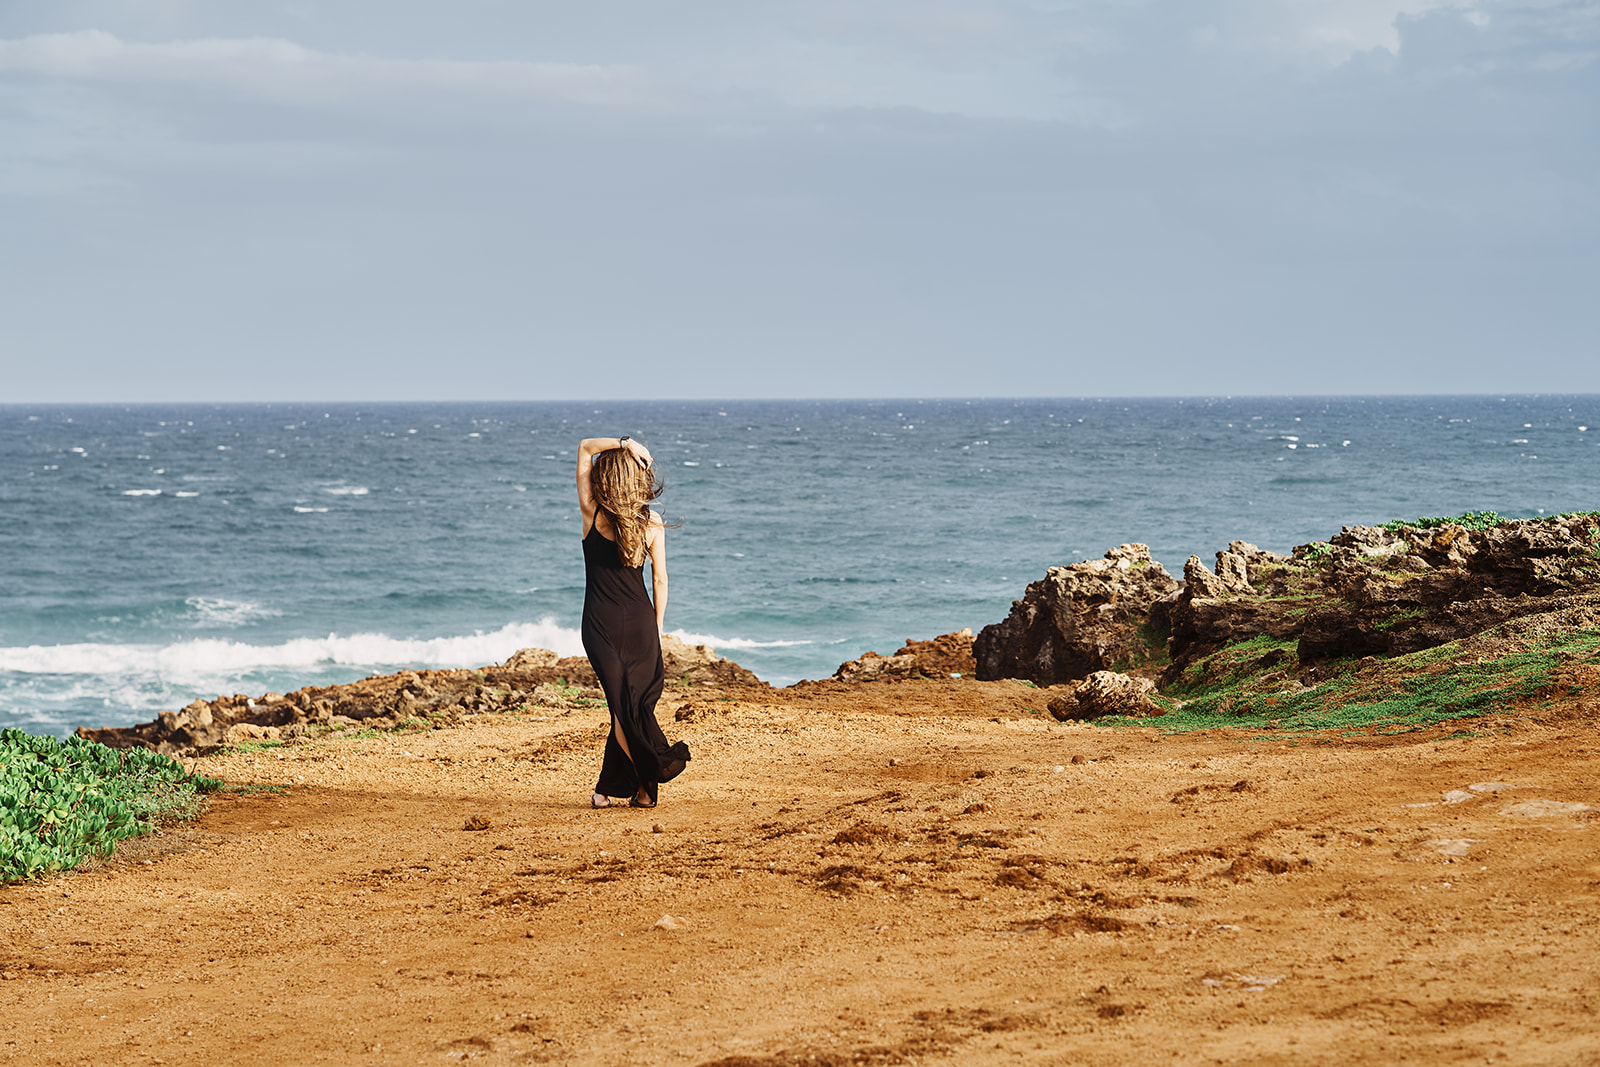 Kauai Beach Photo Inspiration For Solo Portraits